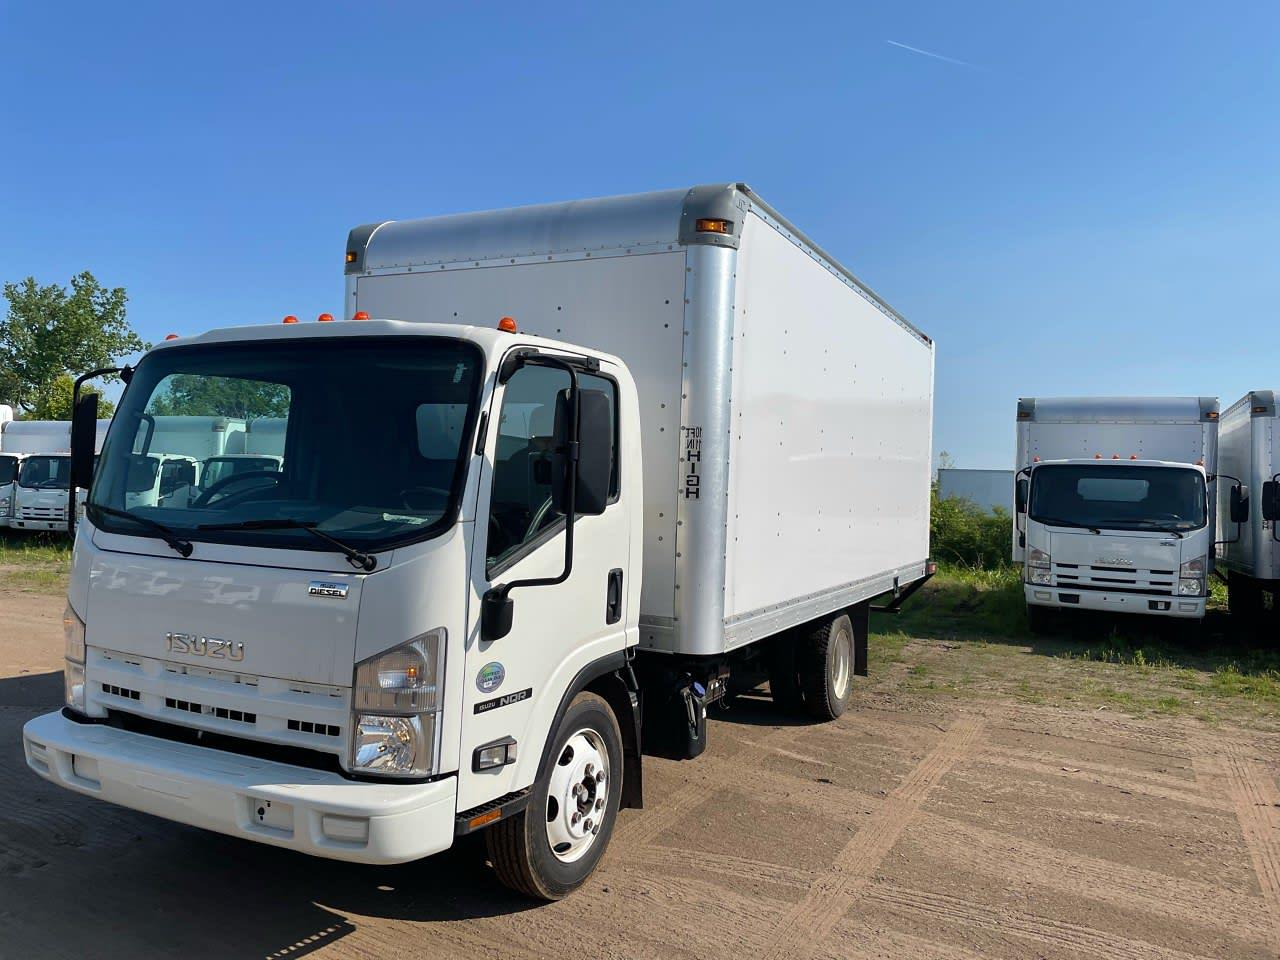 2015 Isuzu NQR Regular Cab 4x2, Dry Freight #650468 - photo 1